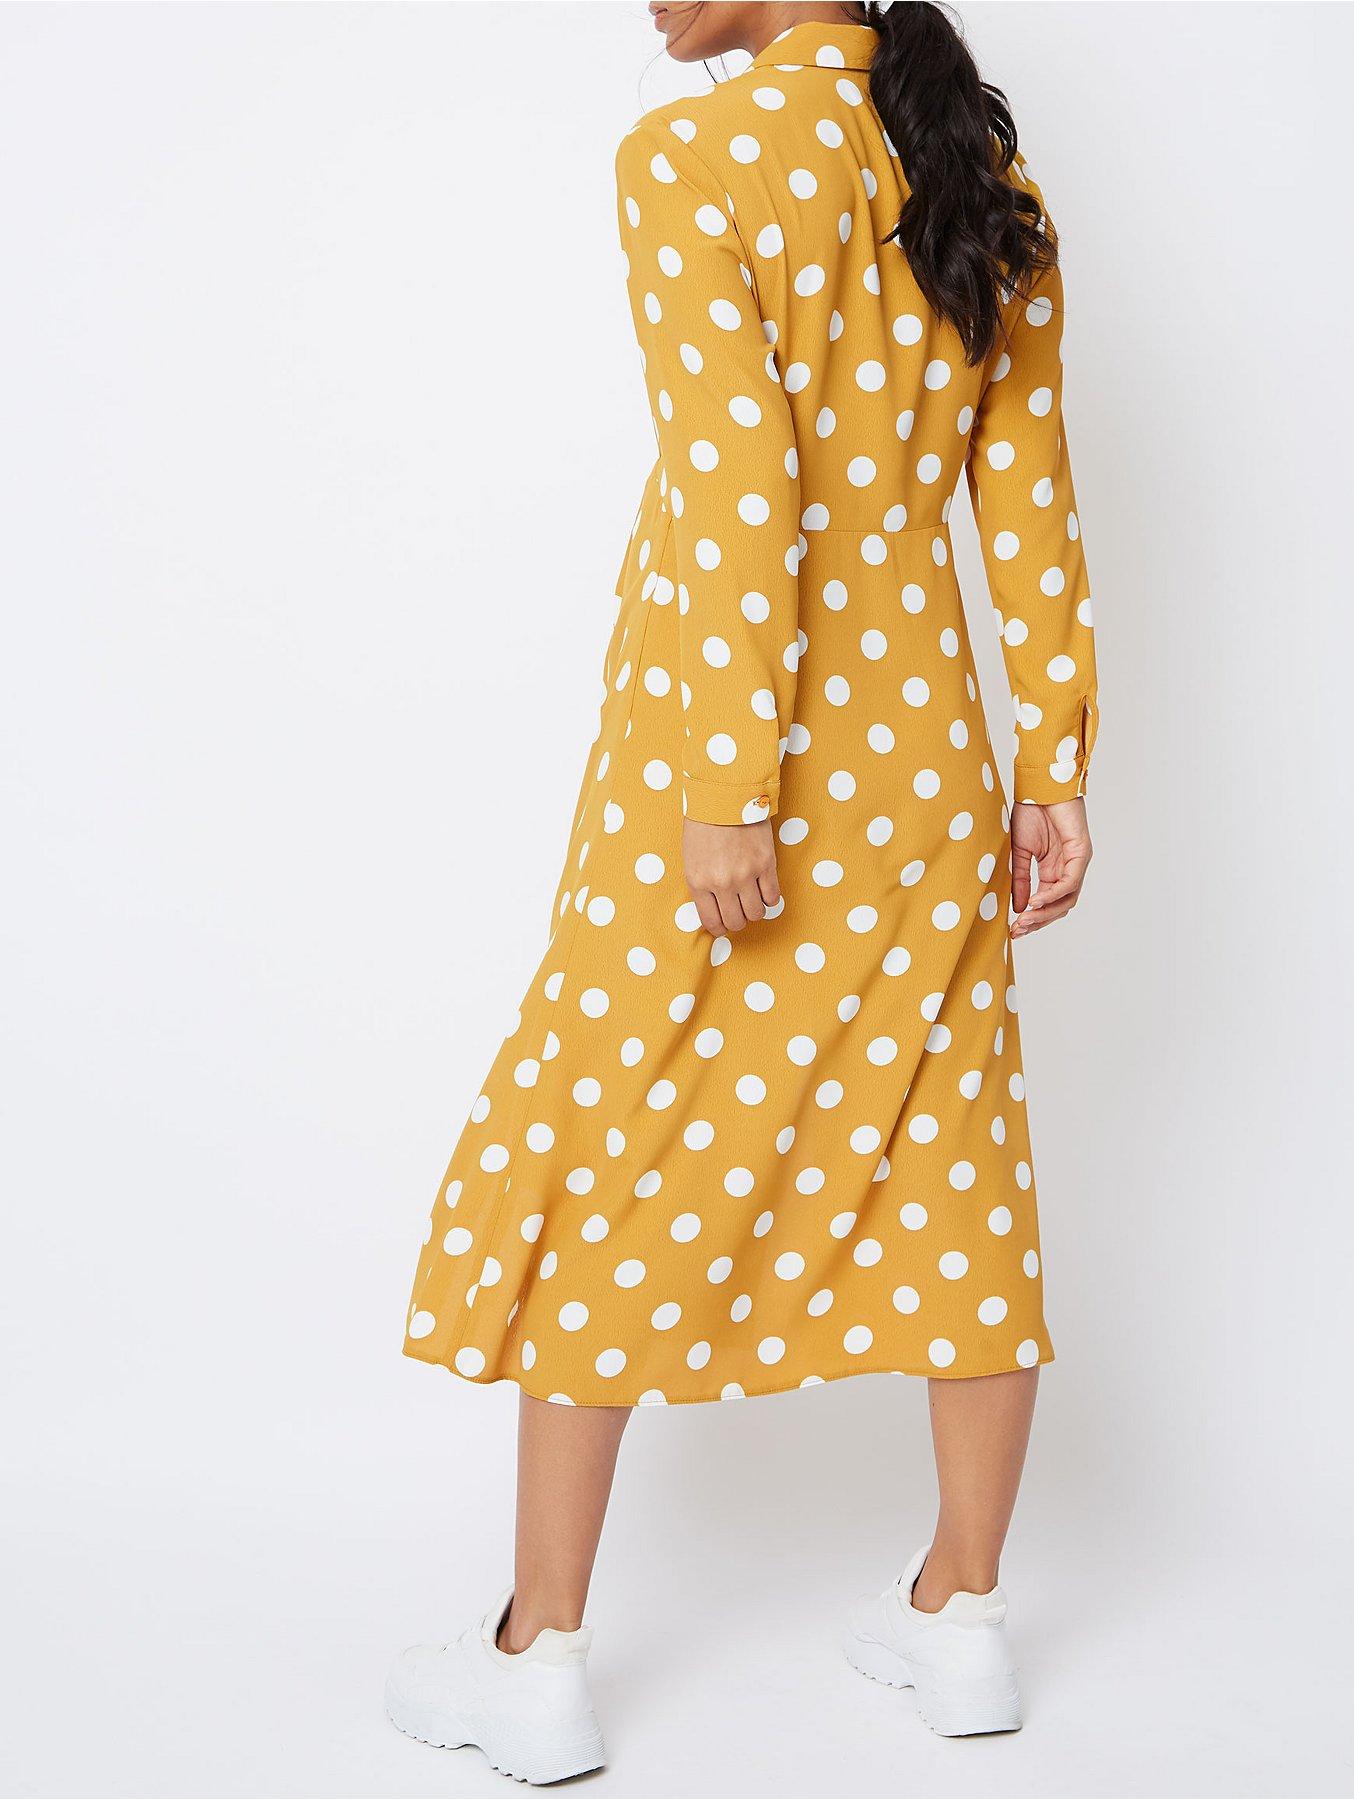 85b74e922a4ea Maternity Yellow Polka Dot Shirt Style Midi Dress | Women | George